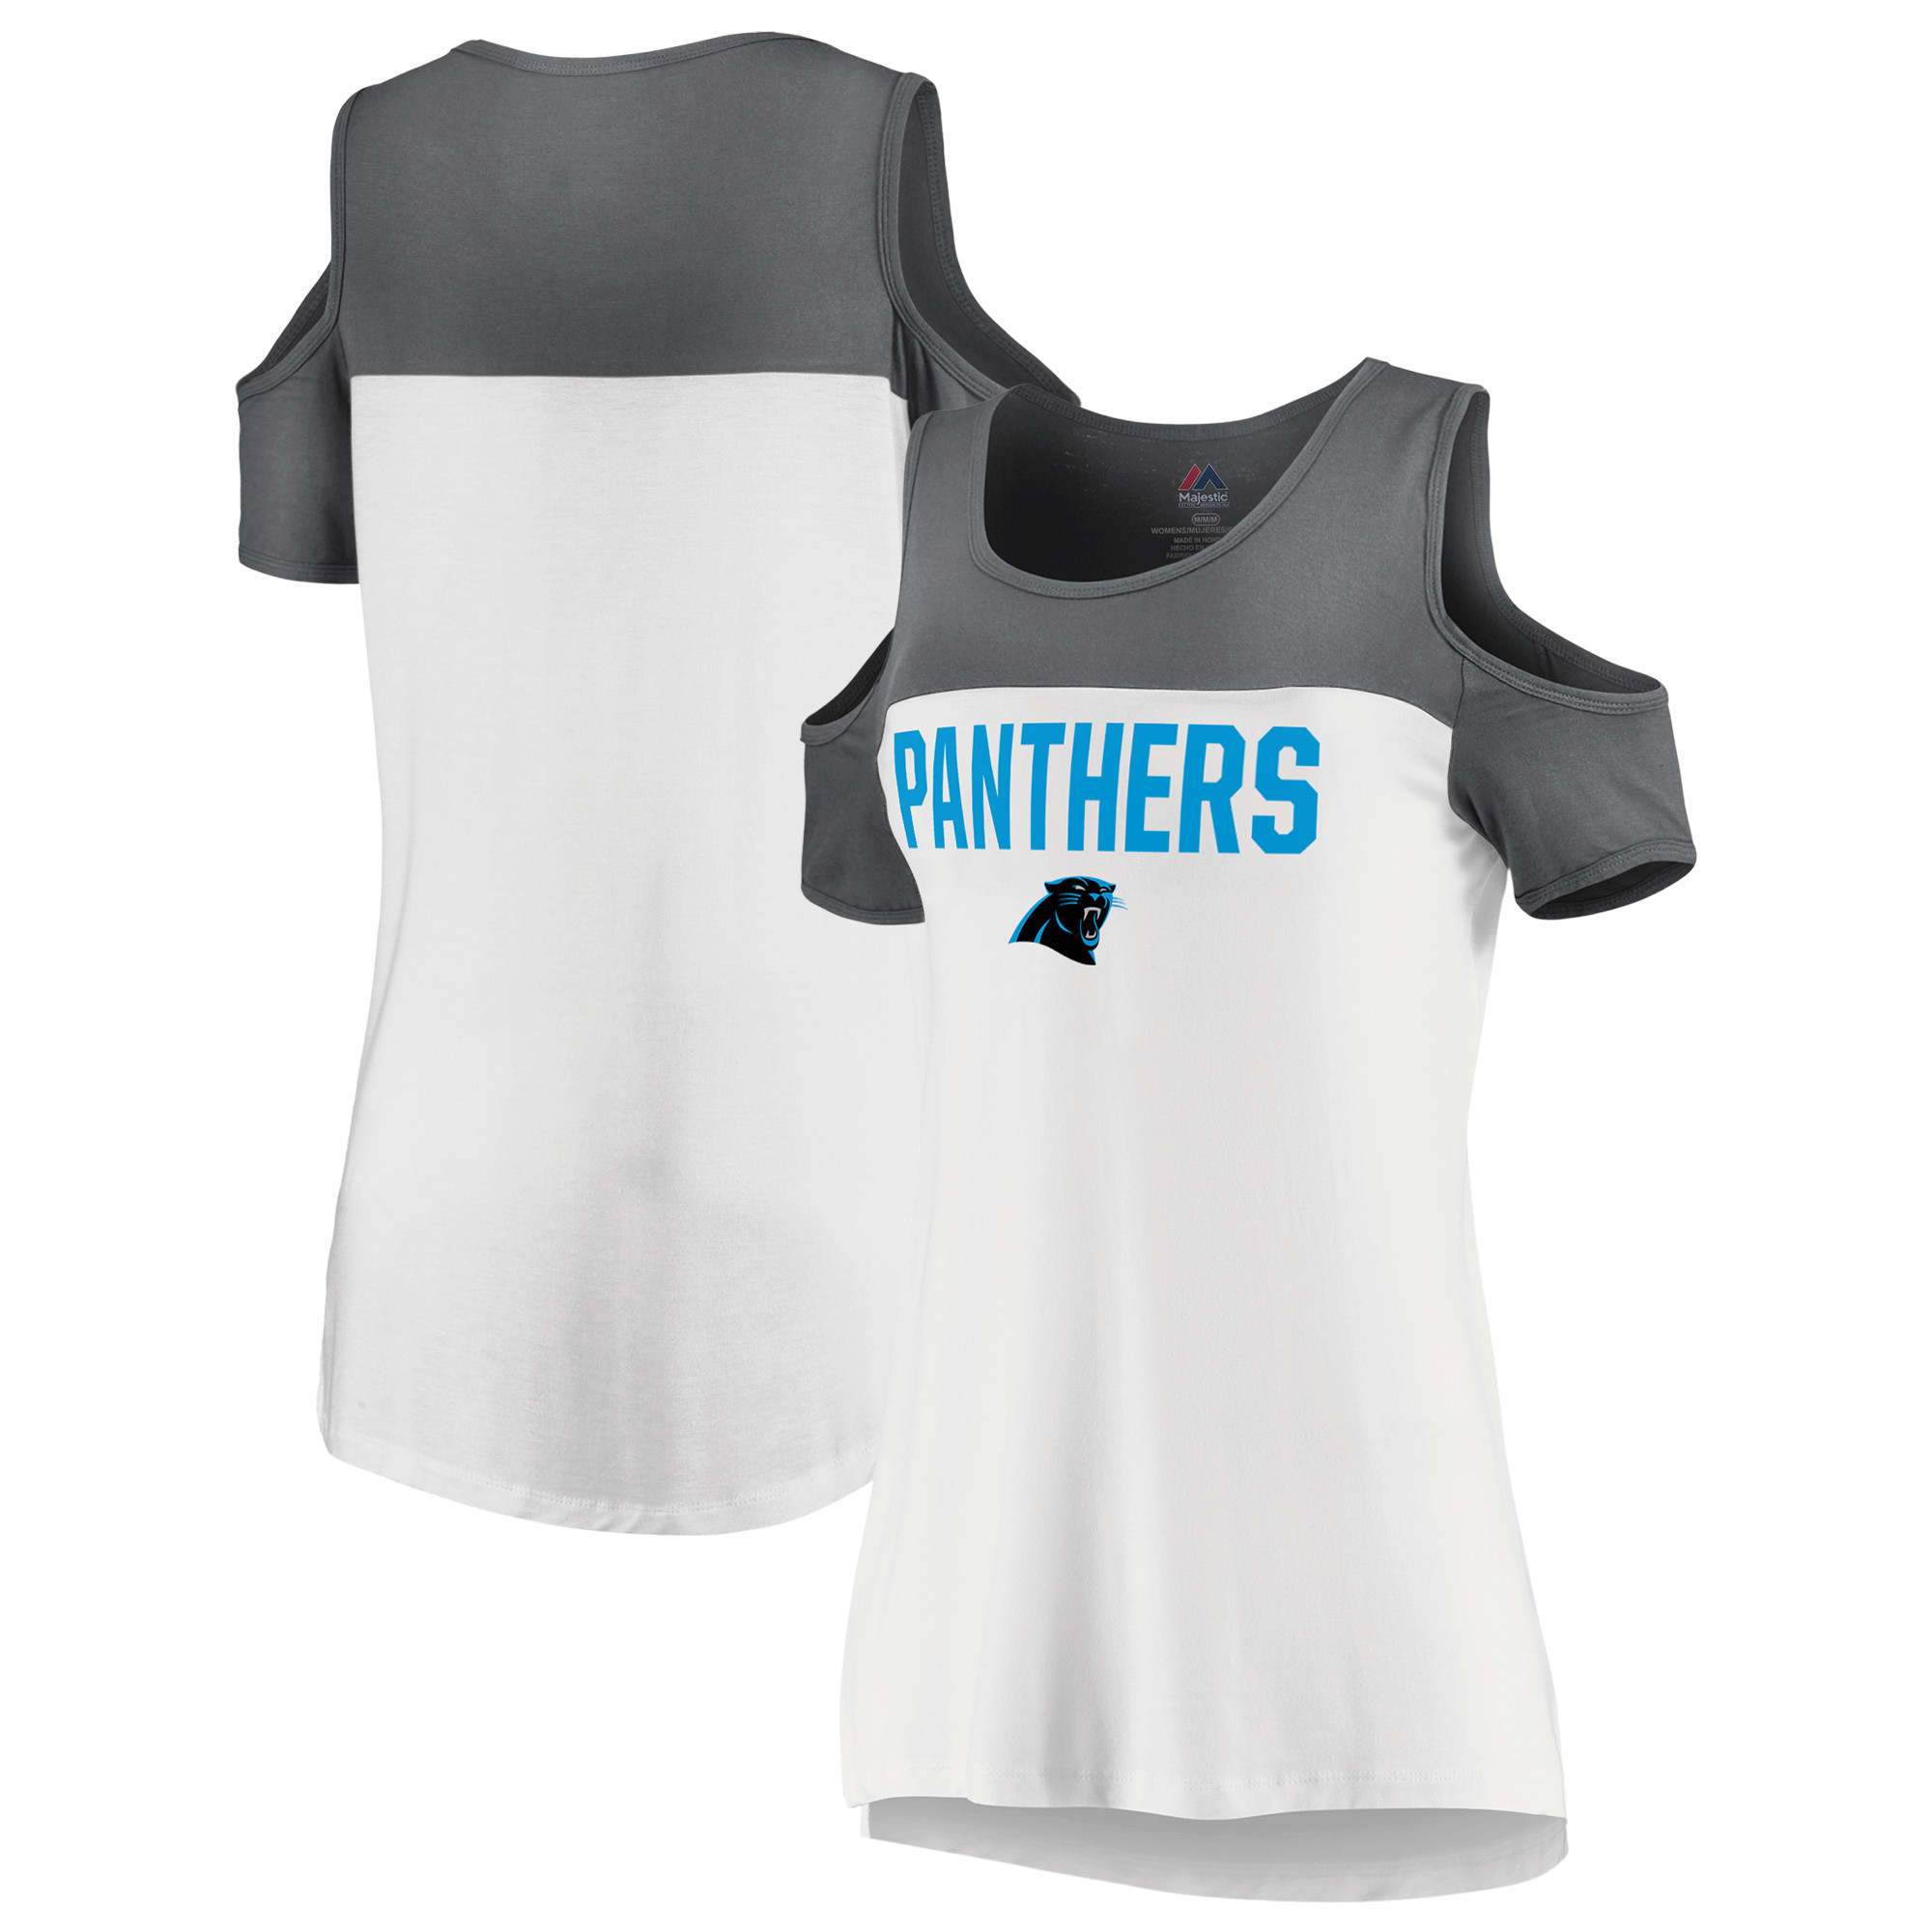 Carolina Panthers Majestic Women's Pure Dedication Open Shoulder T-Shirt - White/Gray